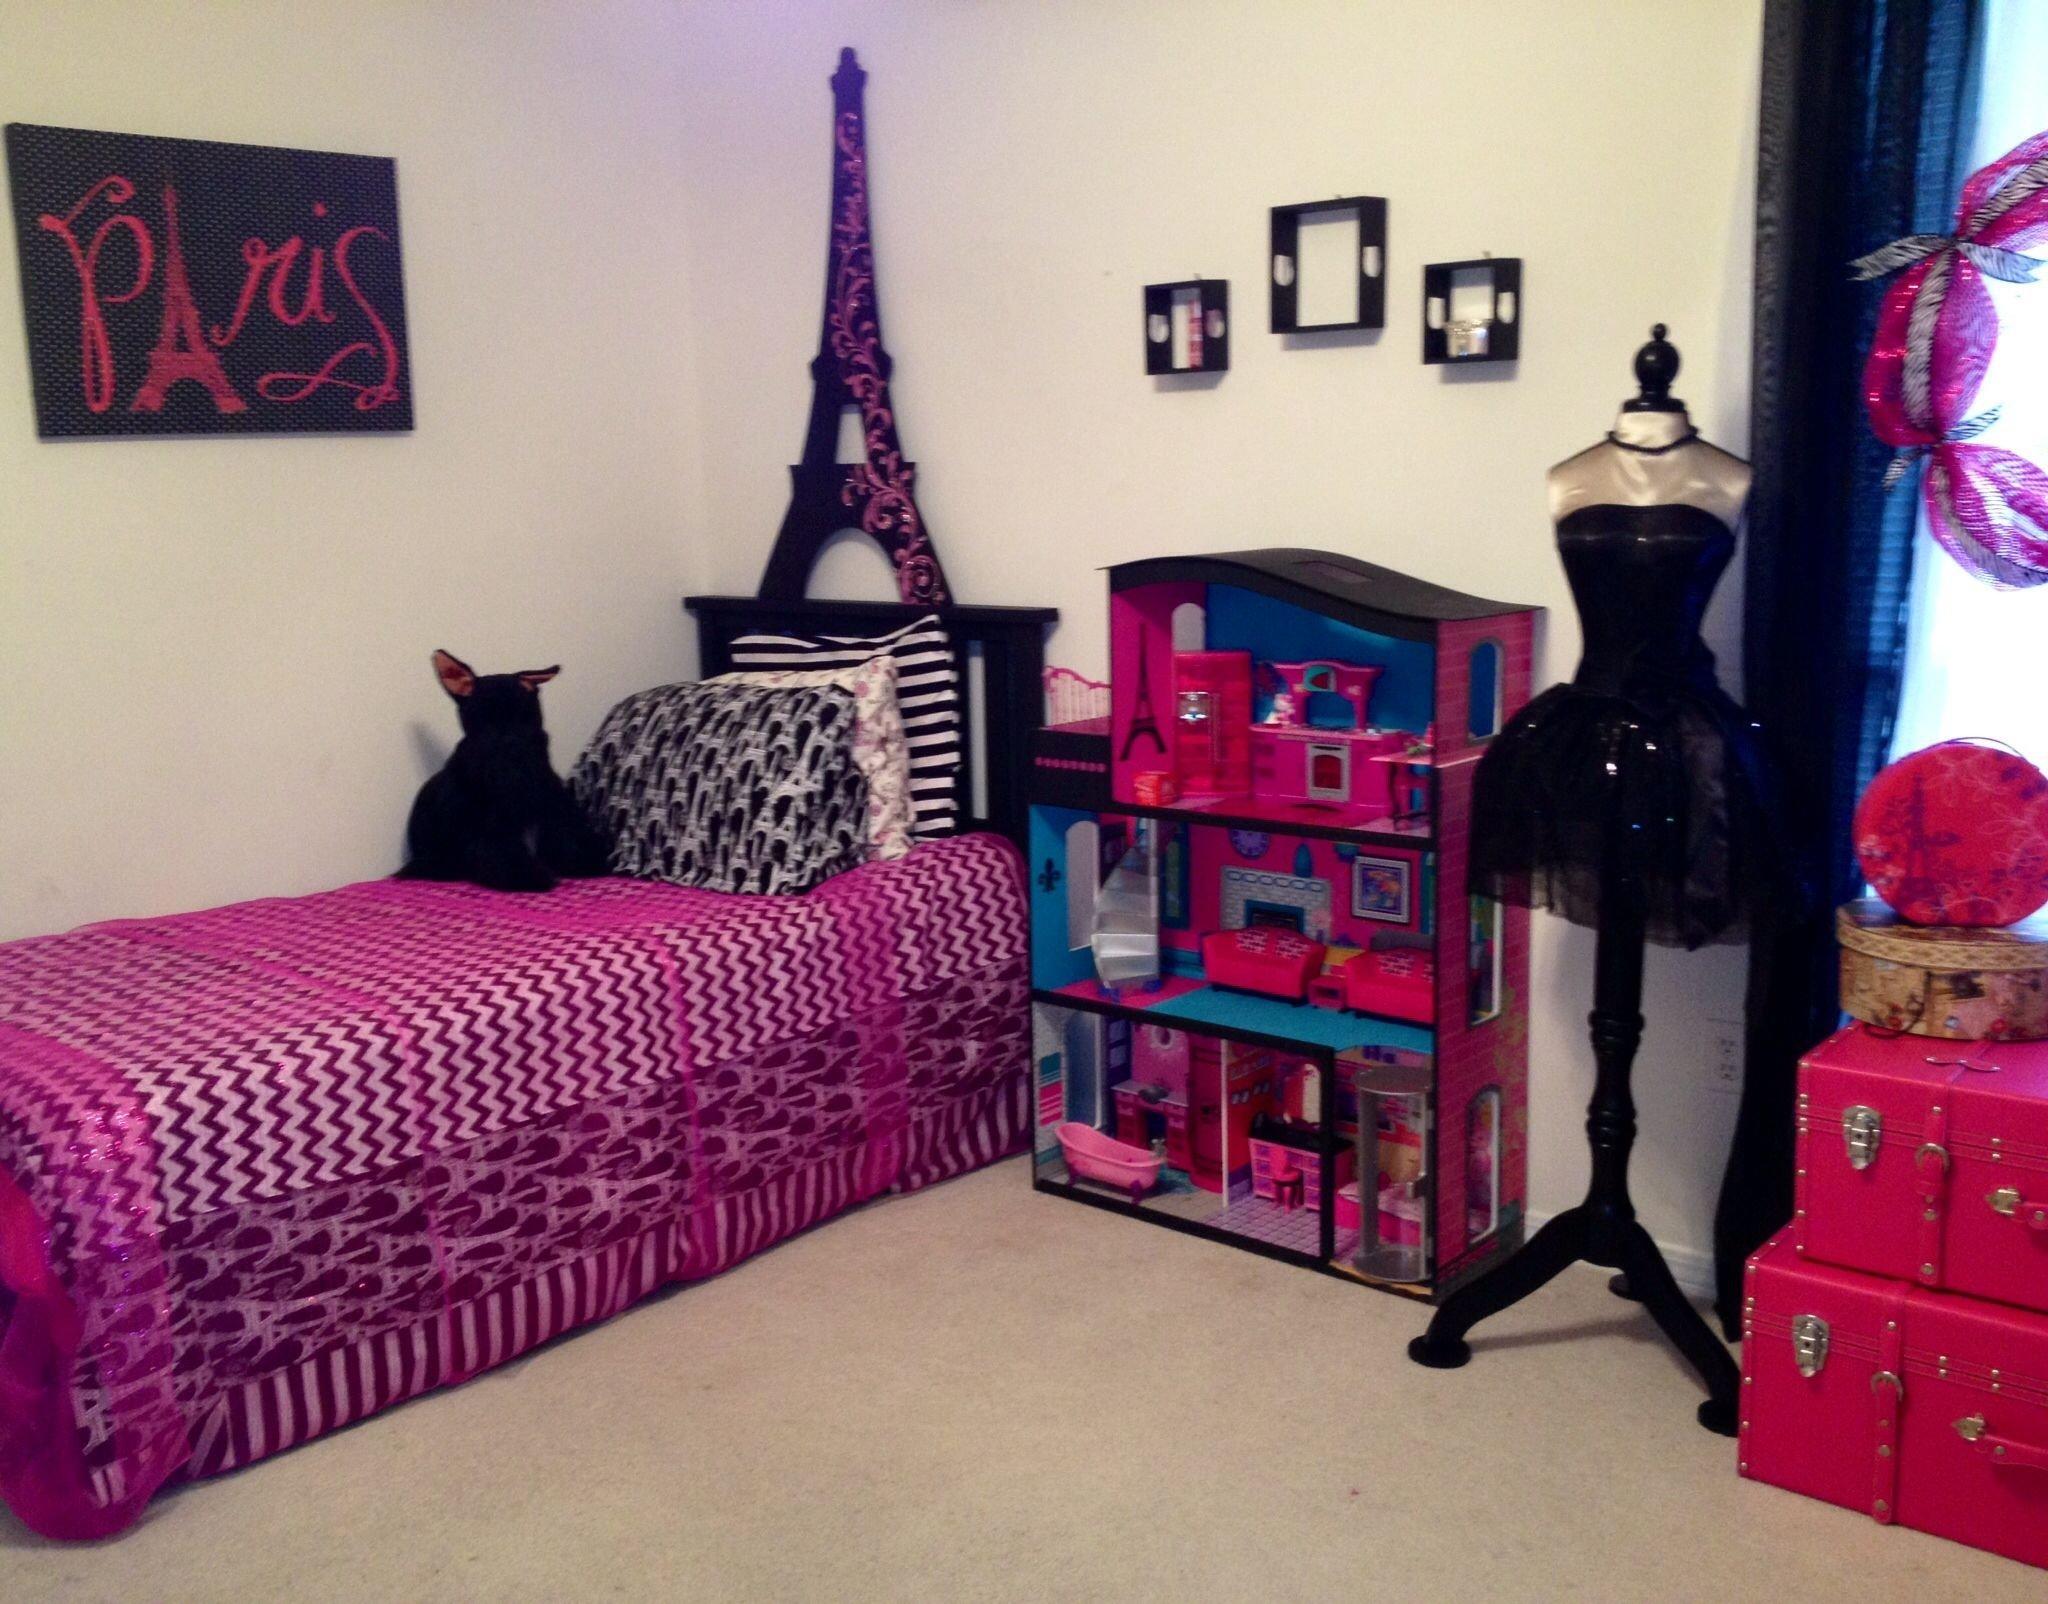 10 Trendy Monster High Room Decor Ideas little girls bedroom to 13 year olds dream room little princess 2020